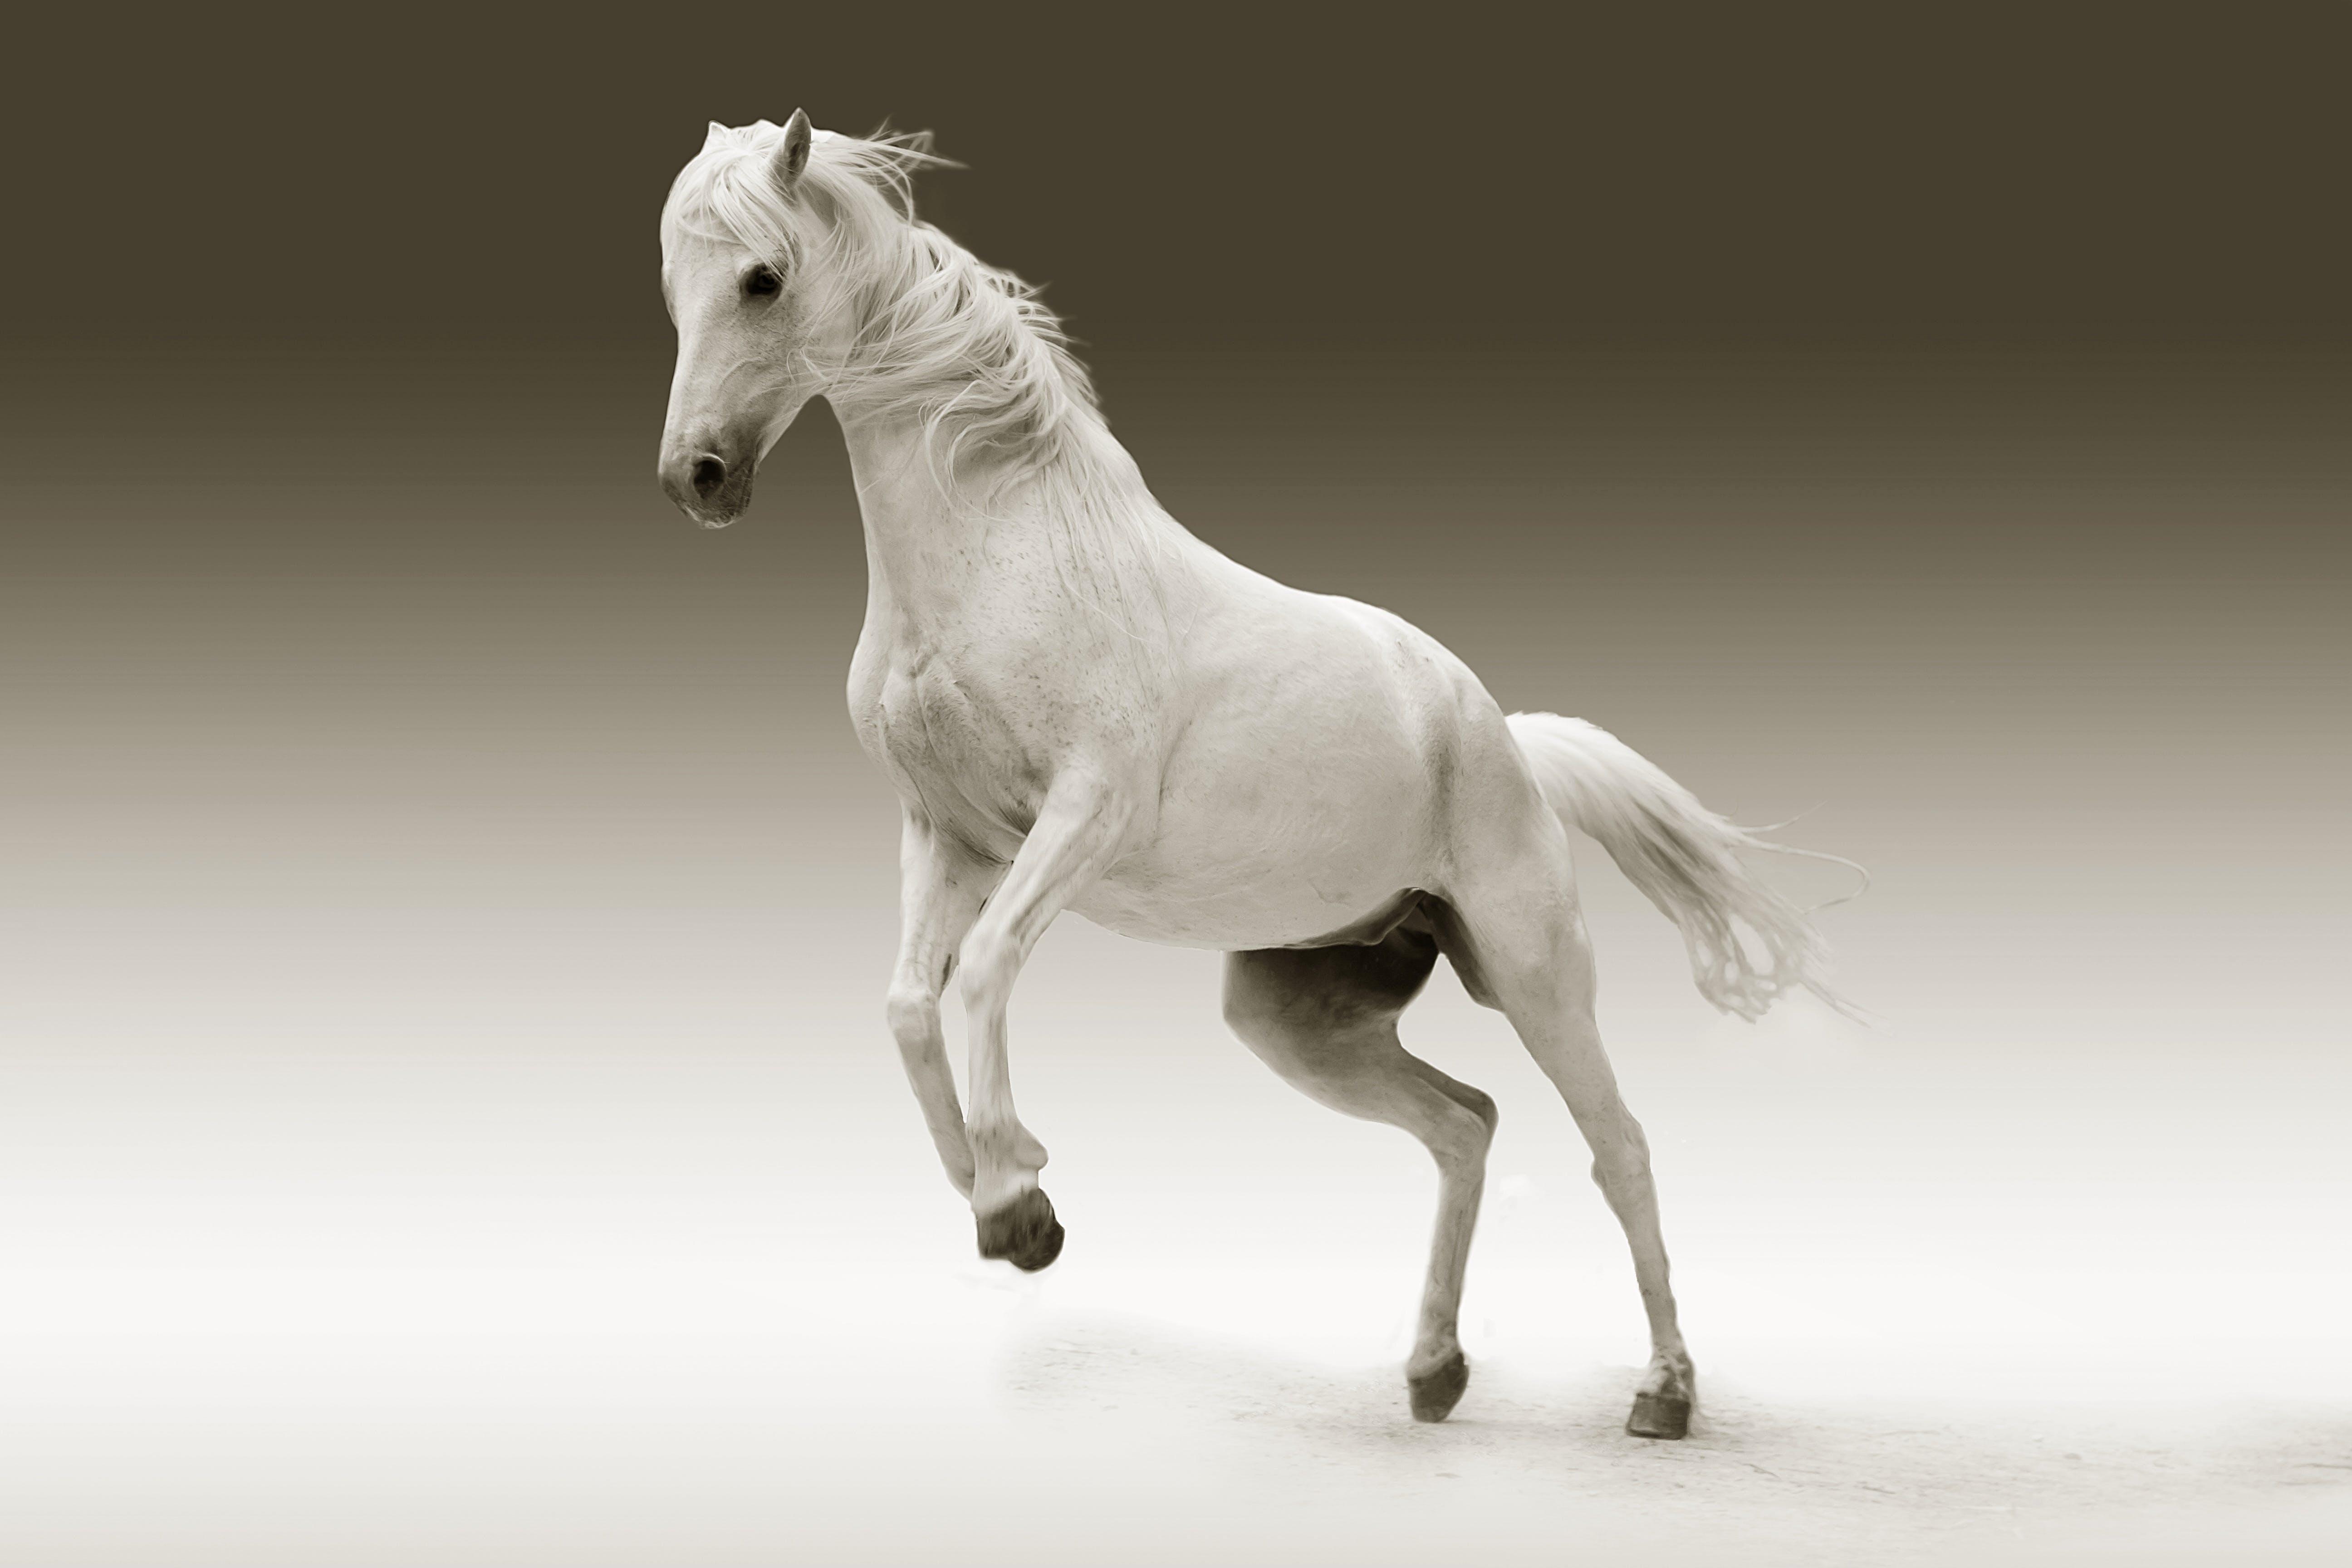 Leaping White Horse Illustration